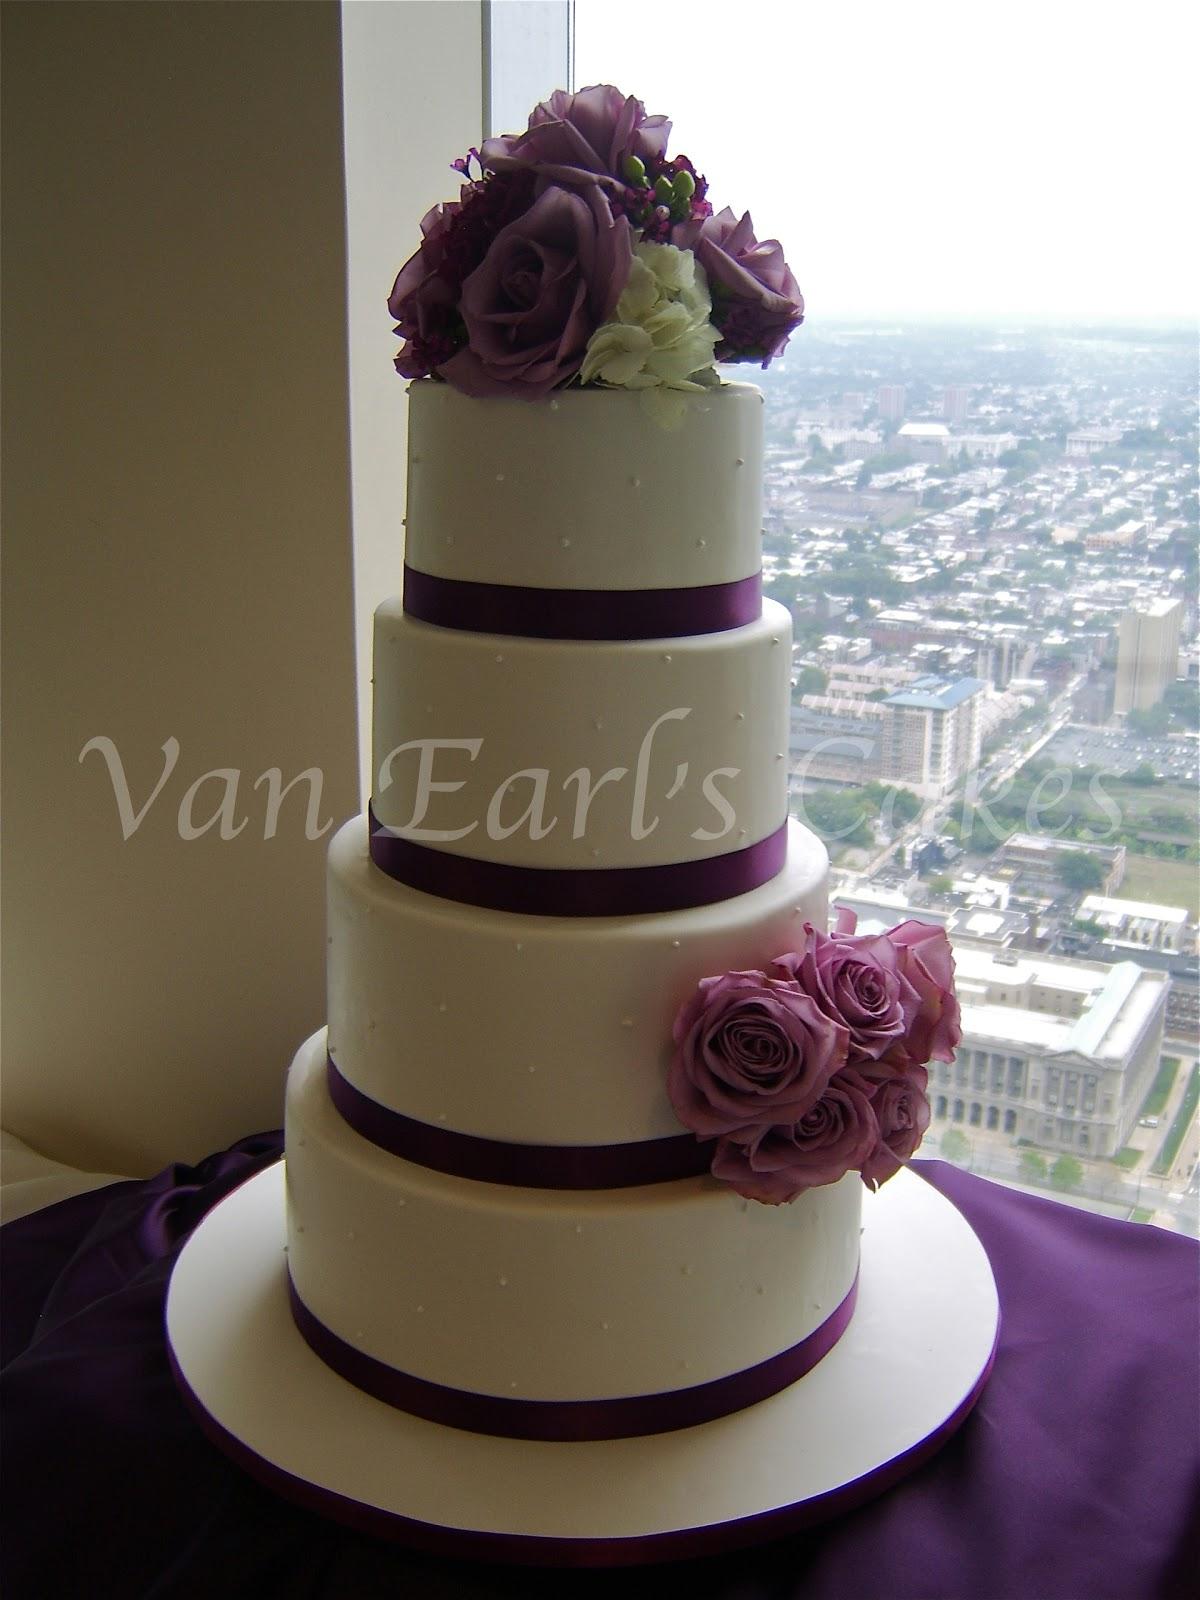 Van Earl s Cakes Purple Rose Theme Wedding Cake